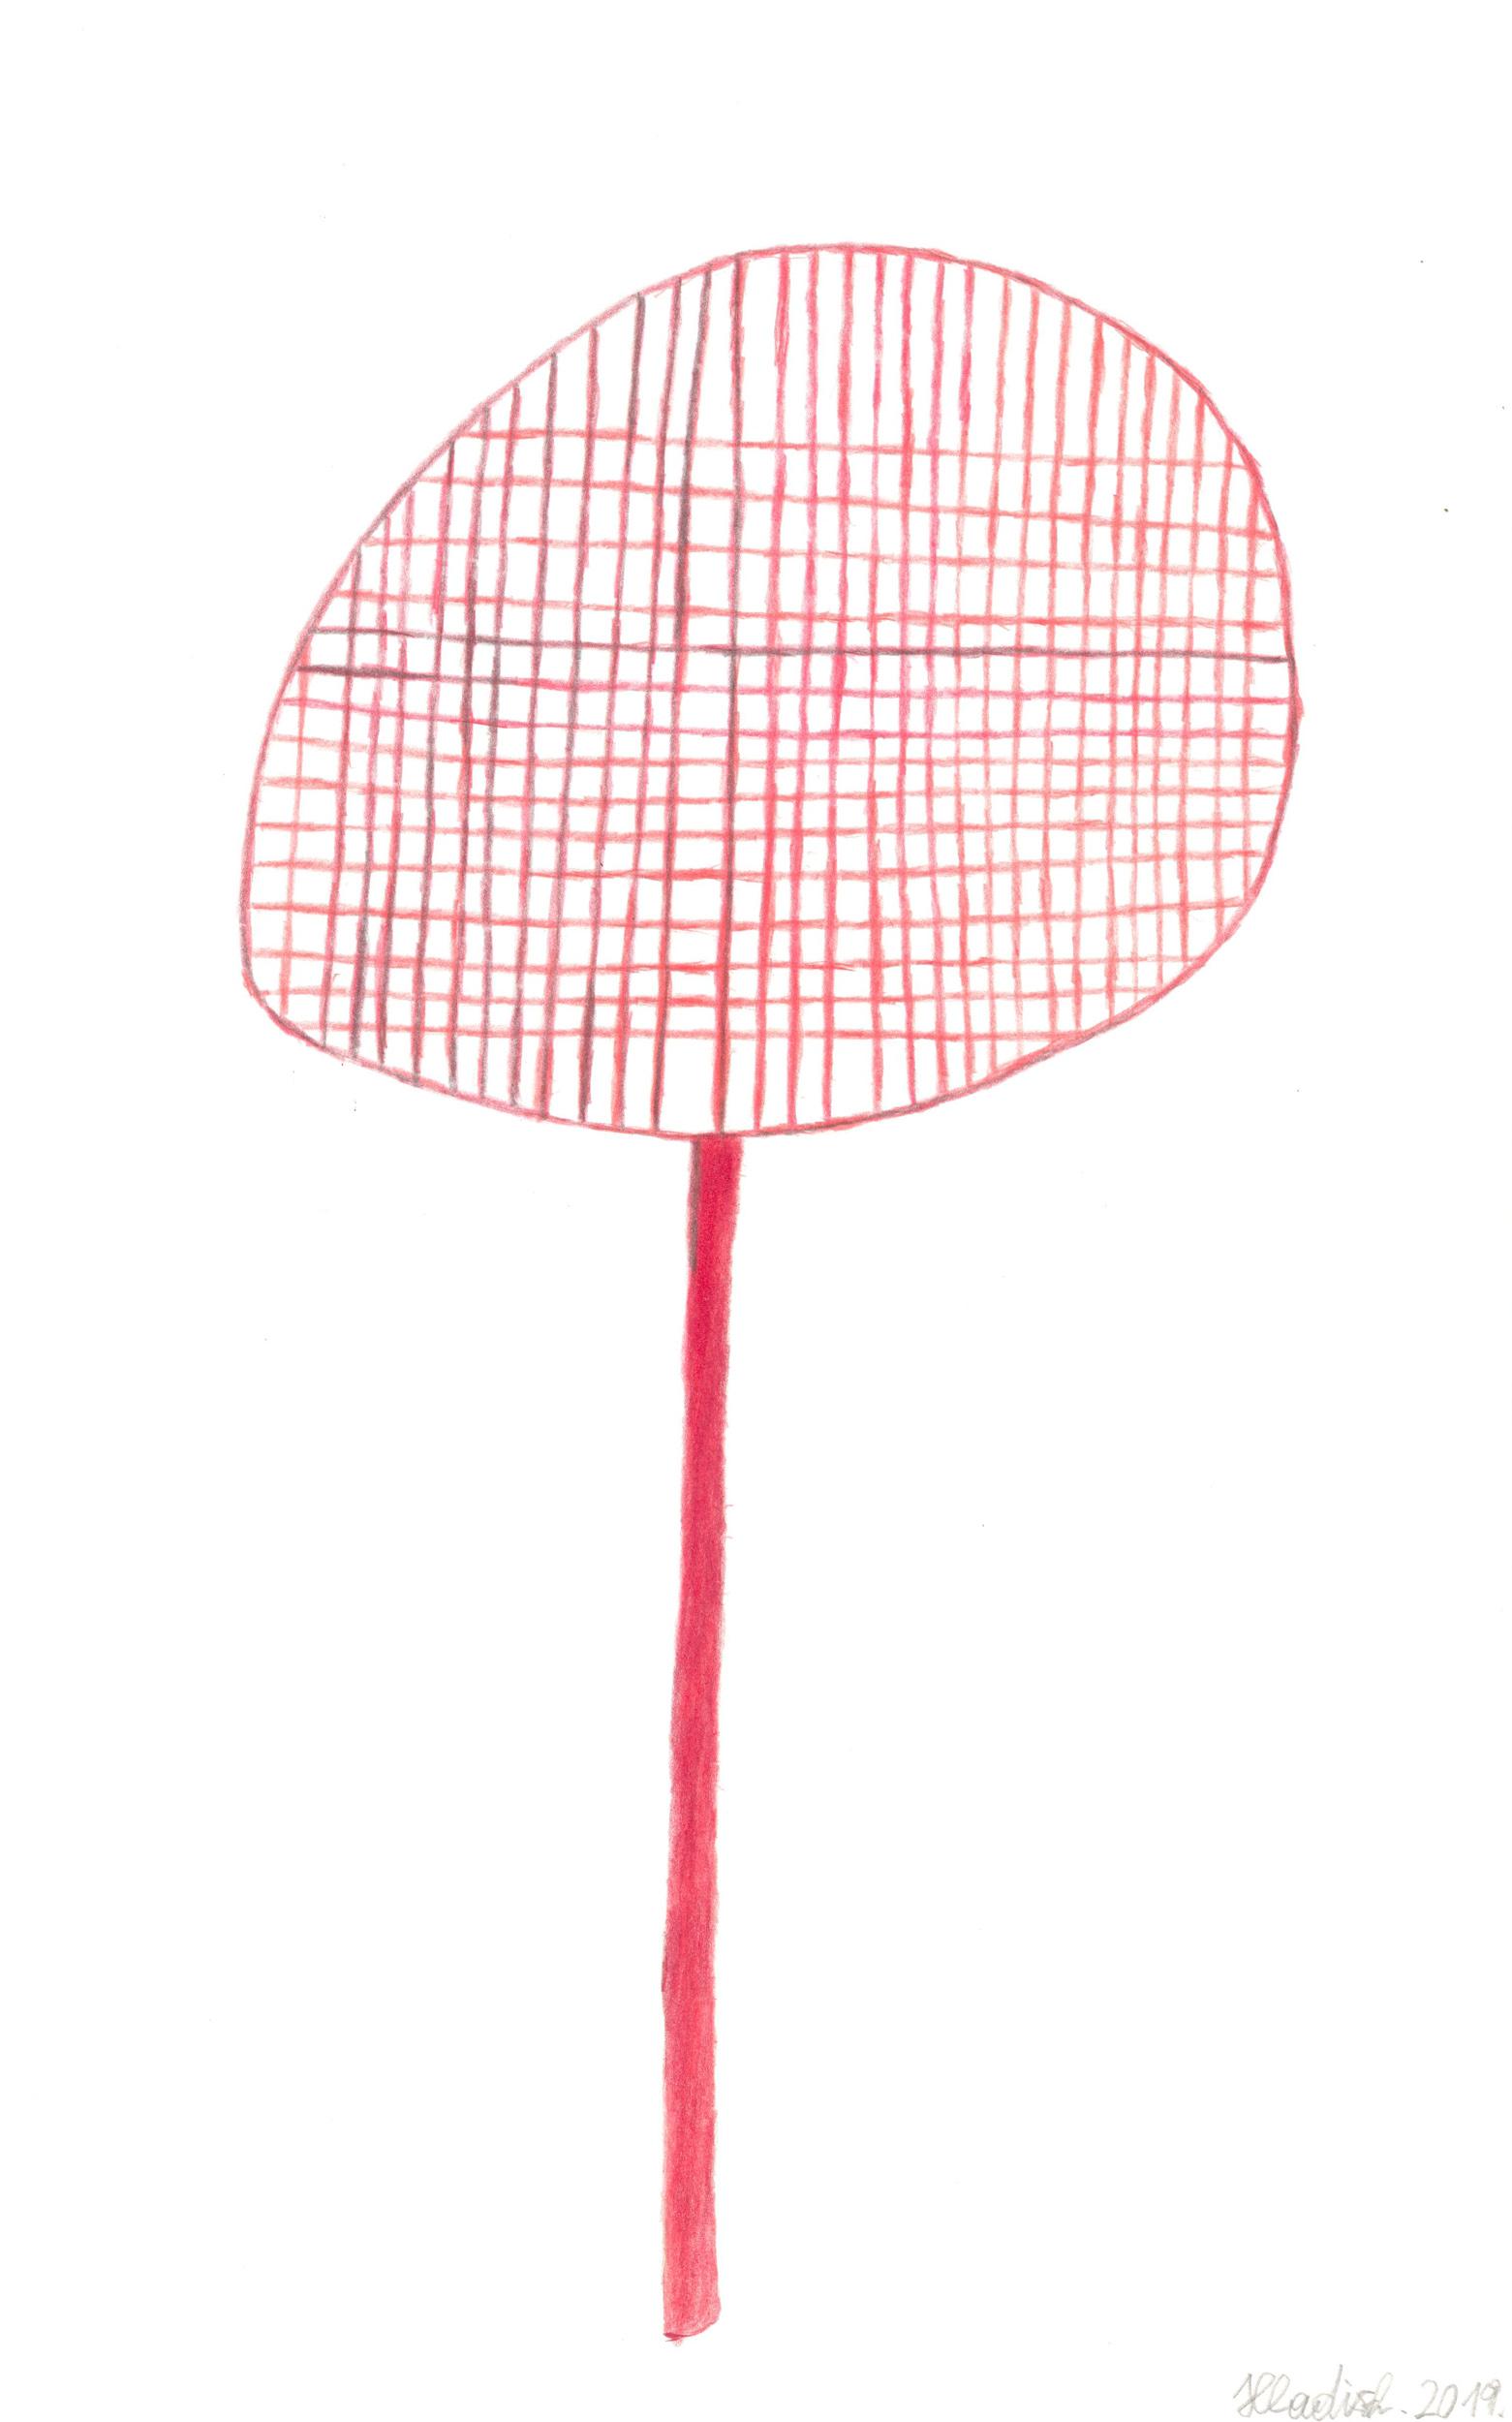 hladisch helmut - fliegenpracker / flyswatter